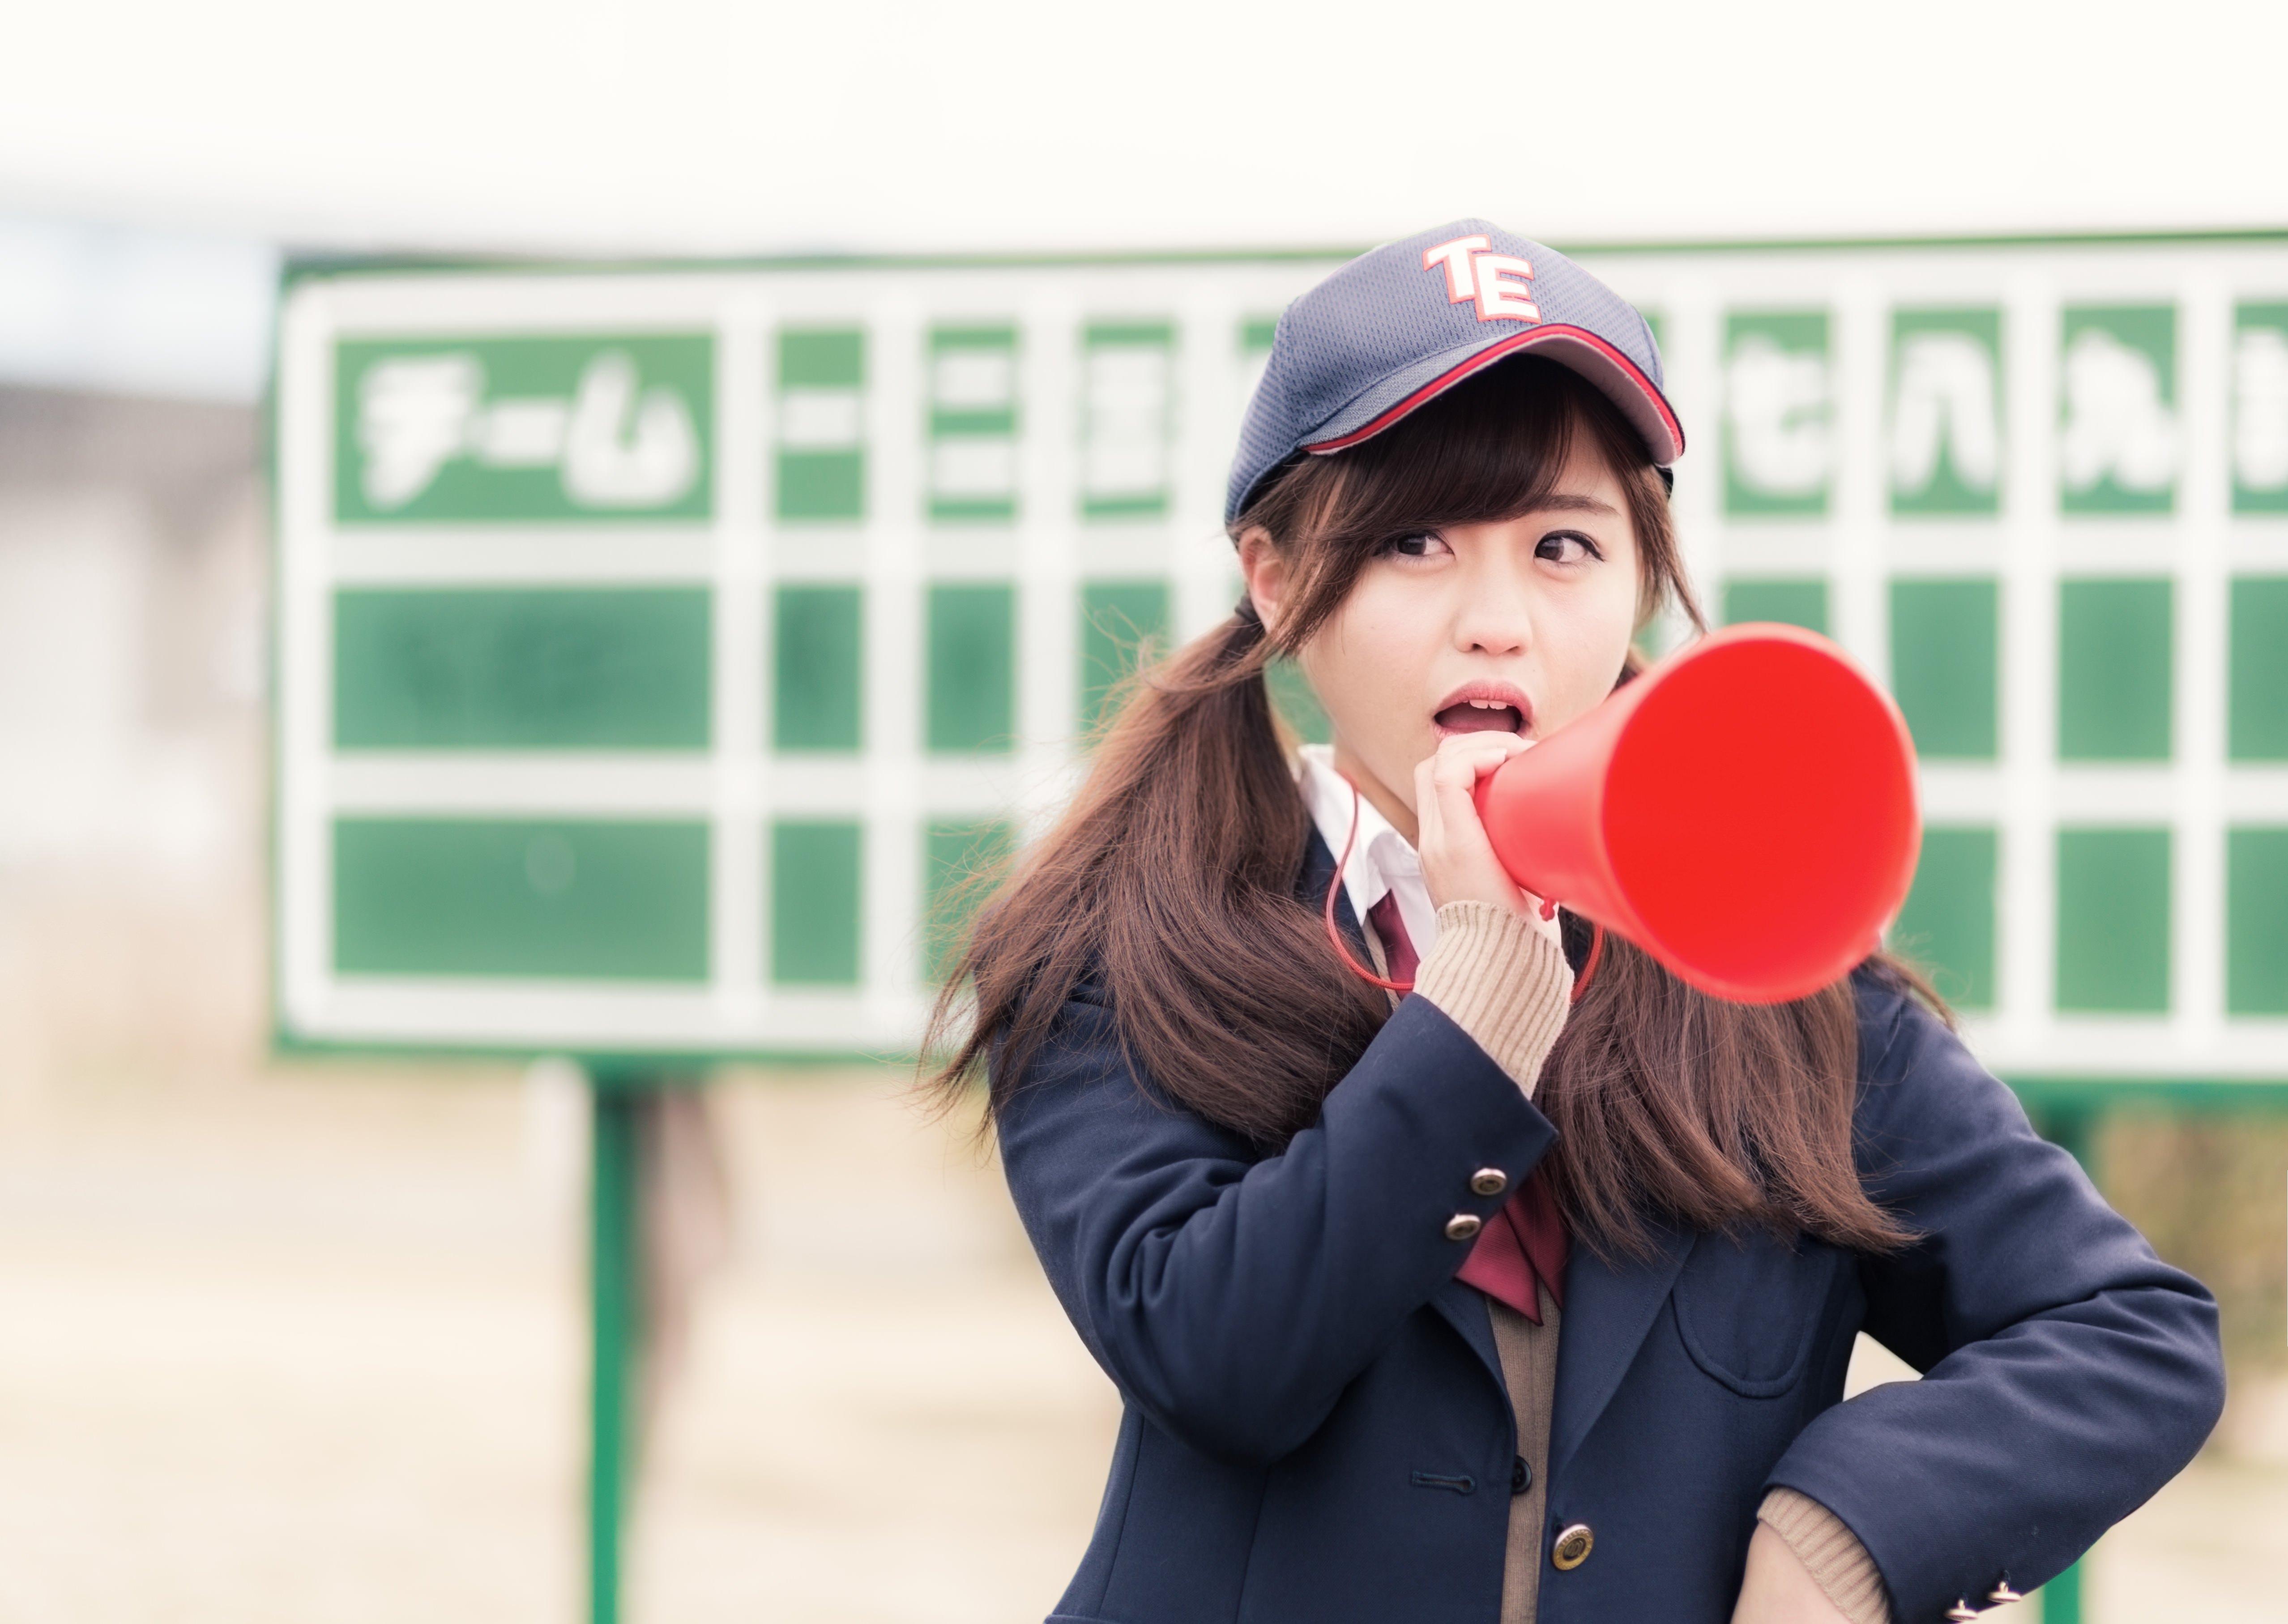 www-pakutaso-com-shared-img-thumb-tsj85_kawamuraouen20150208103603